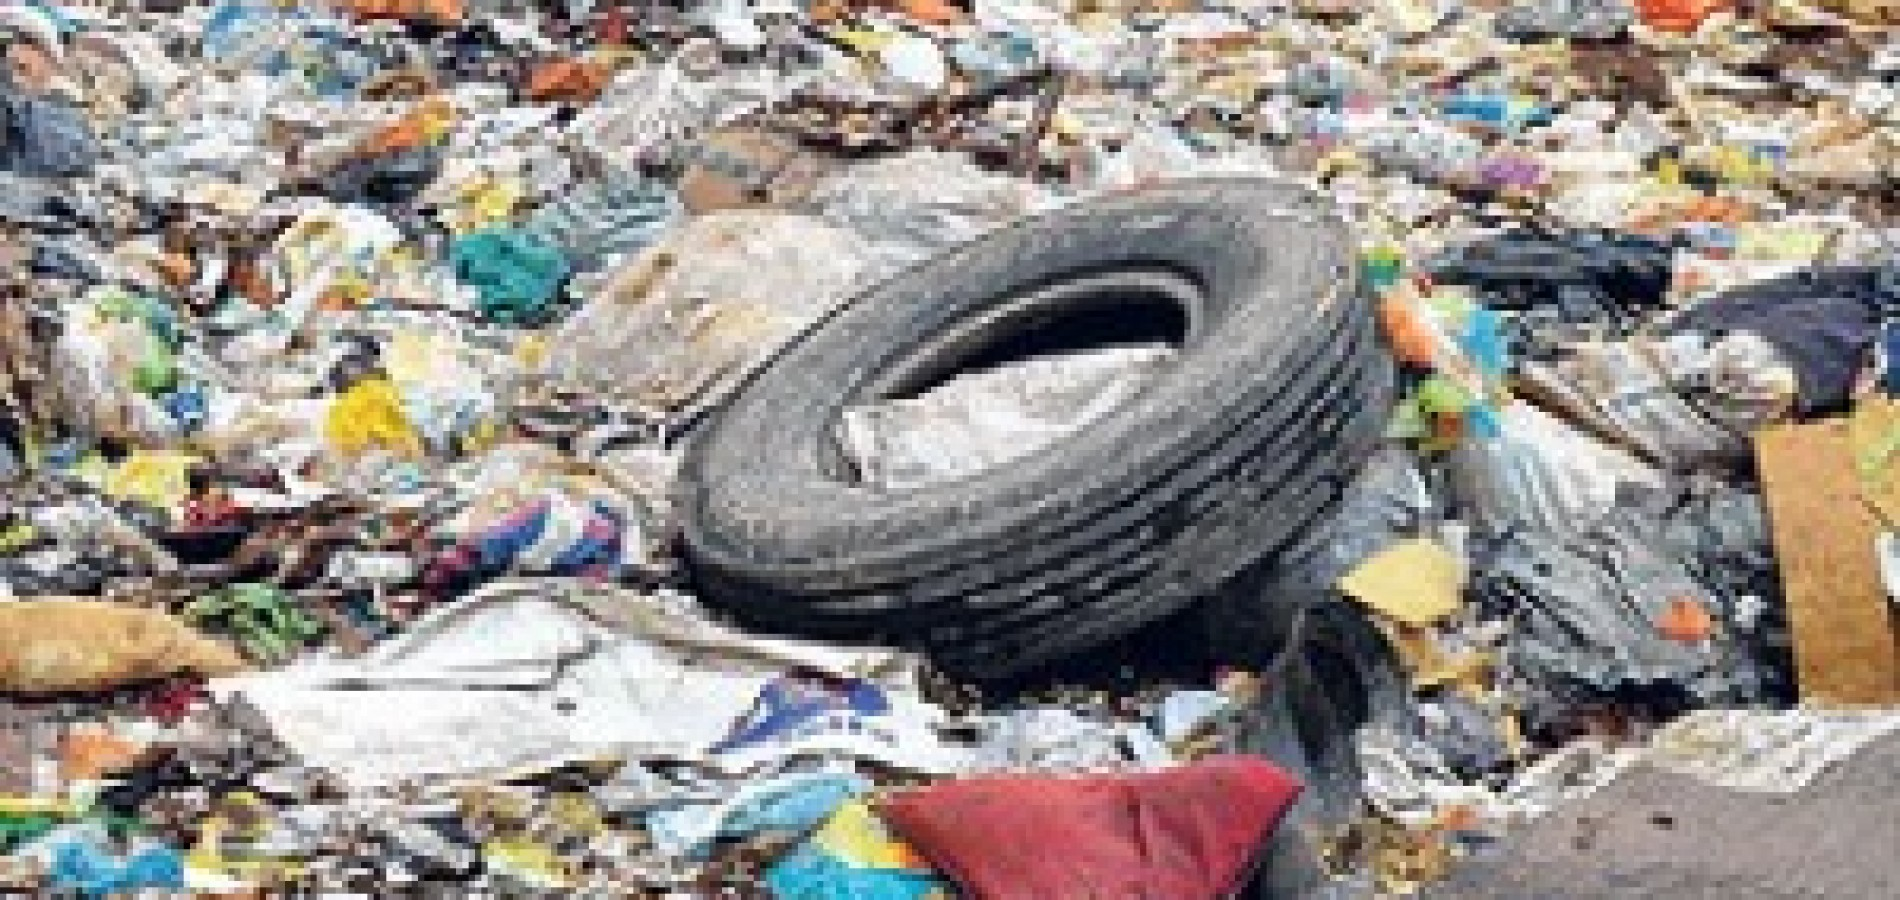 Piauí tem o menor número de municípios com plano integrado de controle de resíduos sólidos